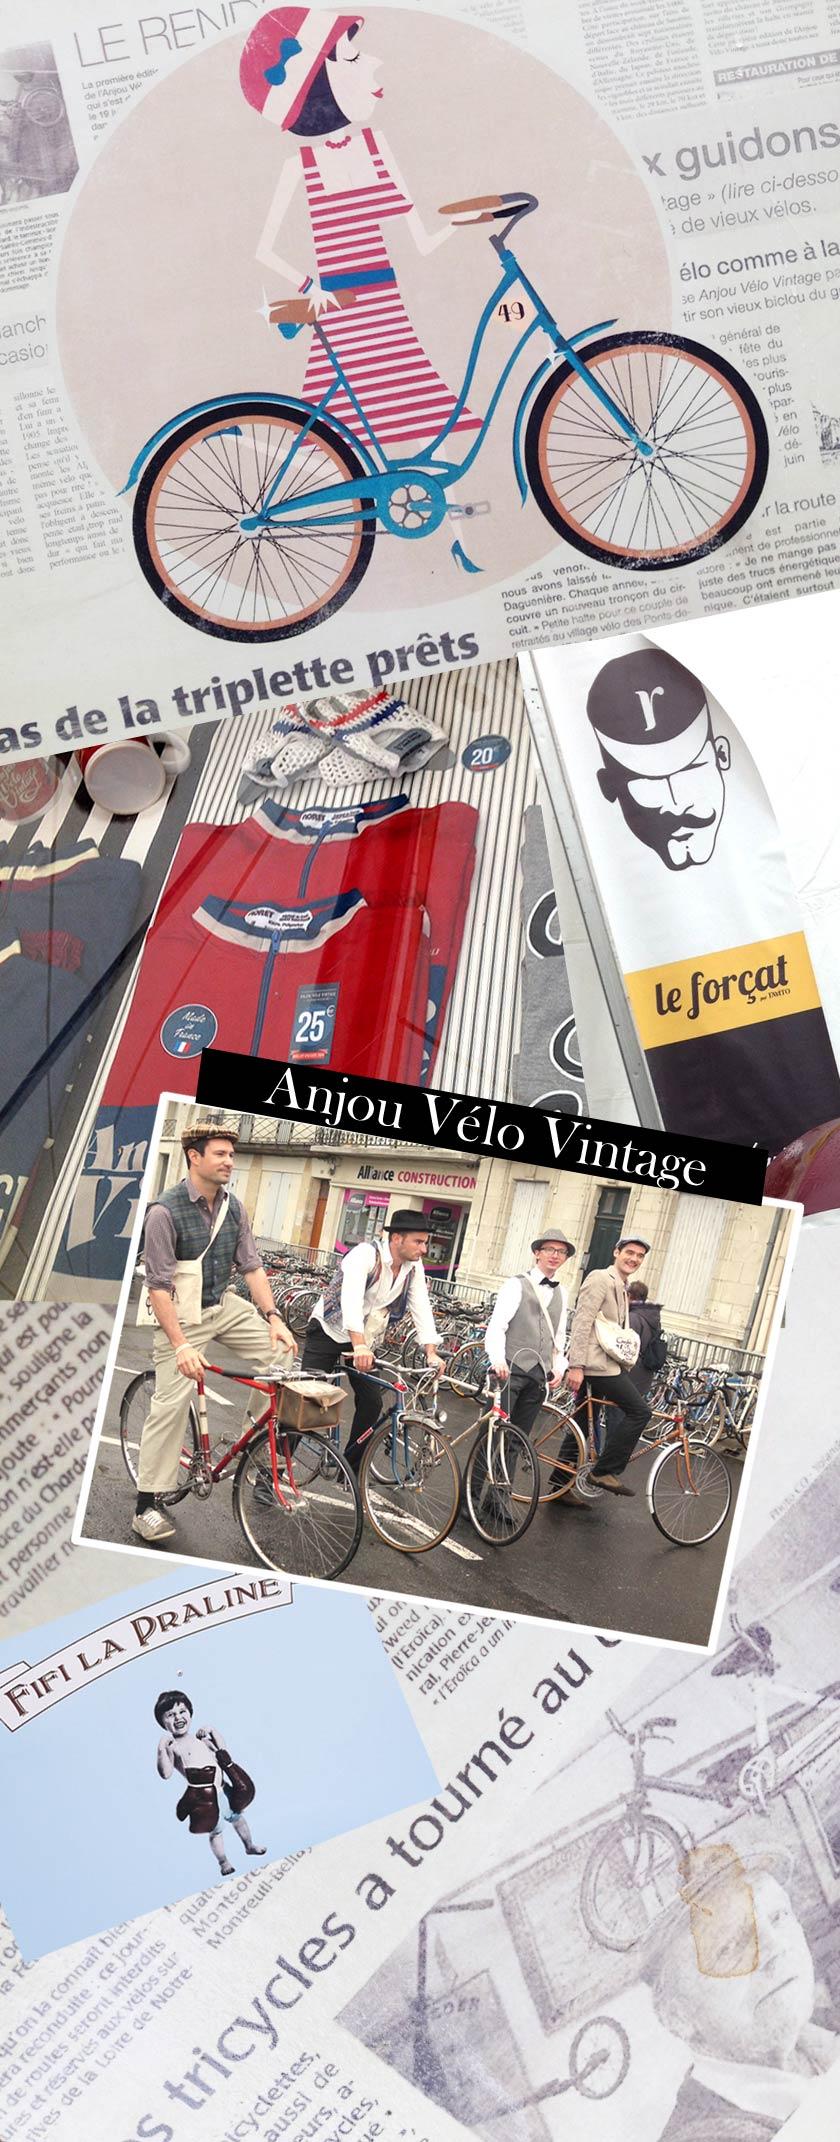 anjou-velo-vintage08